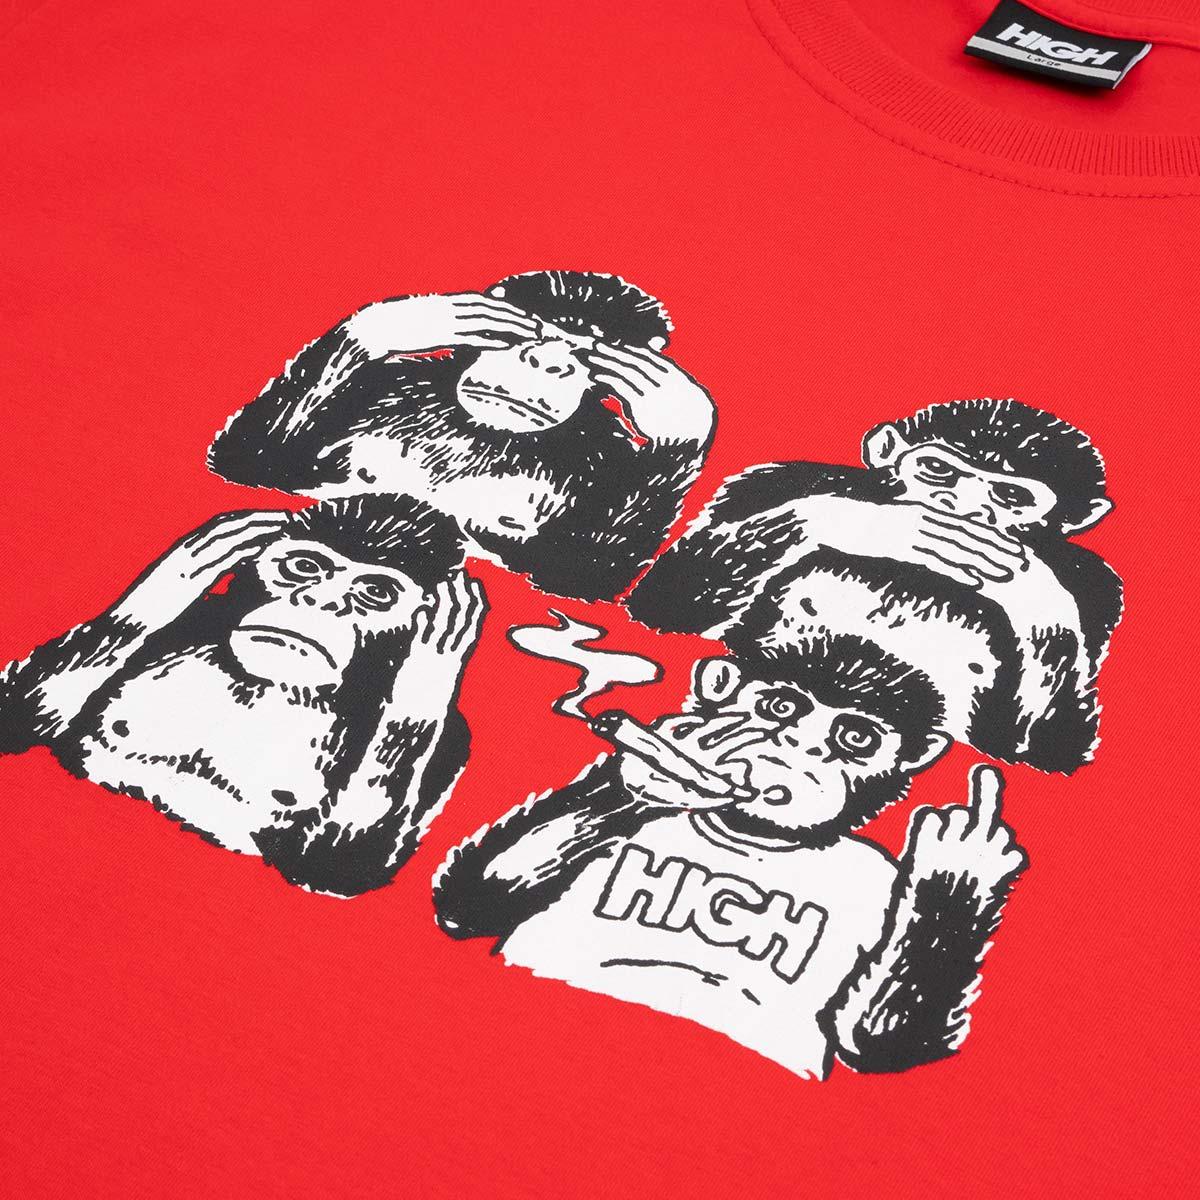 Camiseta High Tee Monkeys Red